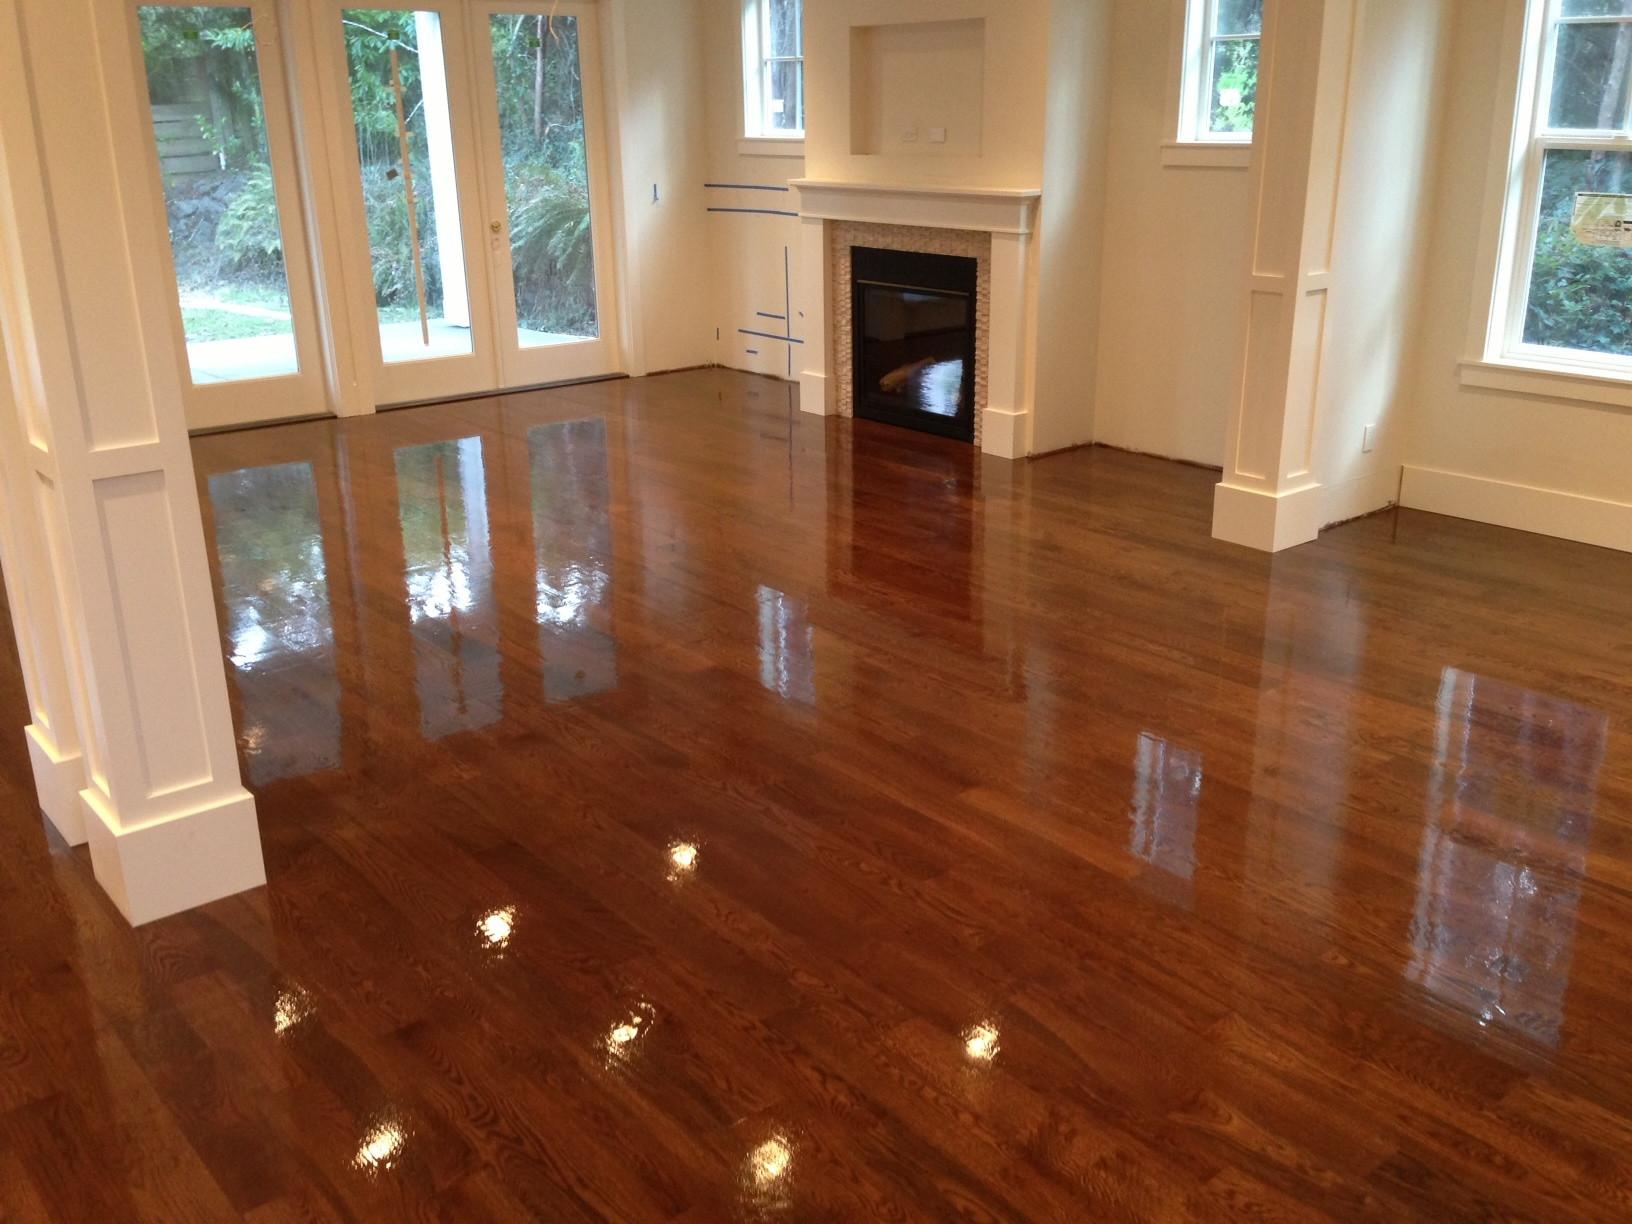 hardwood flooring ajax pickering of core cleaning by empress in renew hardwood